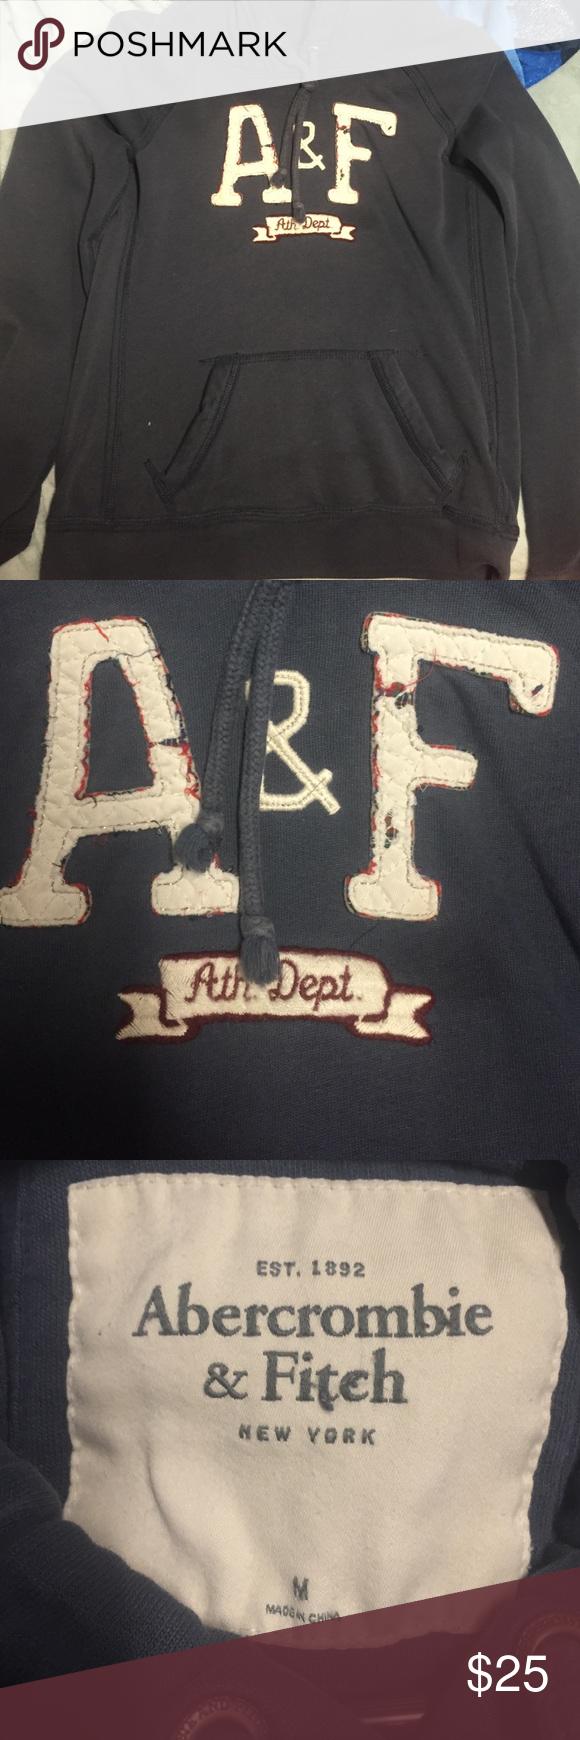 Abercrombie & Fitch Sweater Dark Blue, Medium, Hardly worn Abercrombie & Fitch Tops Sweatshirts & Hoodies